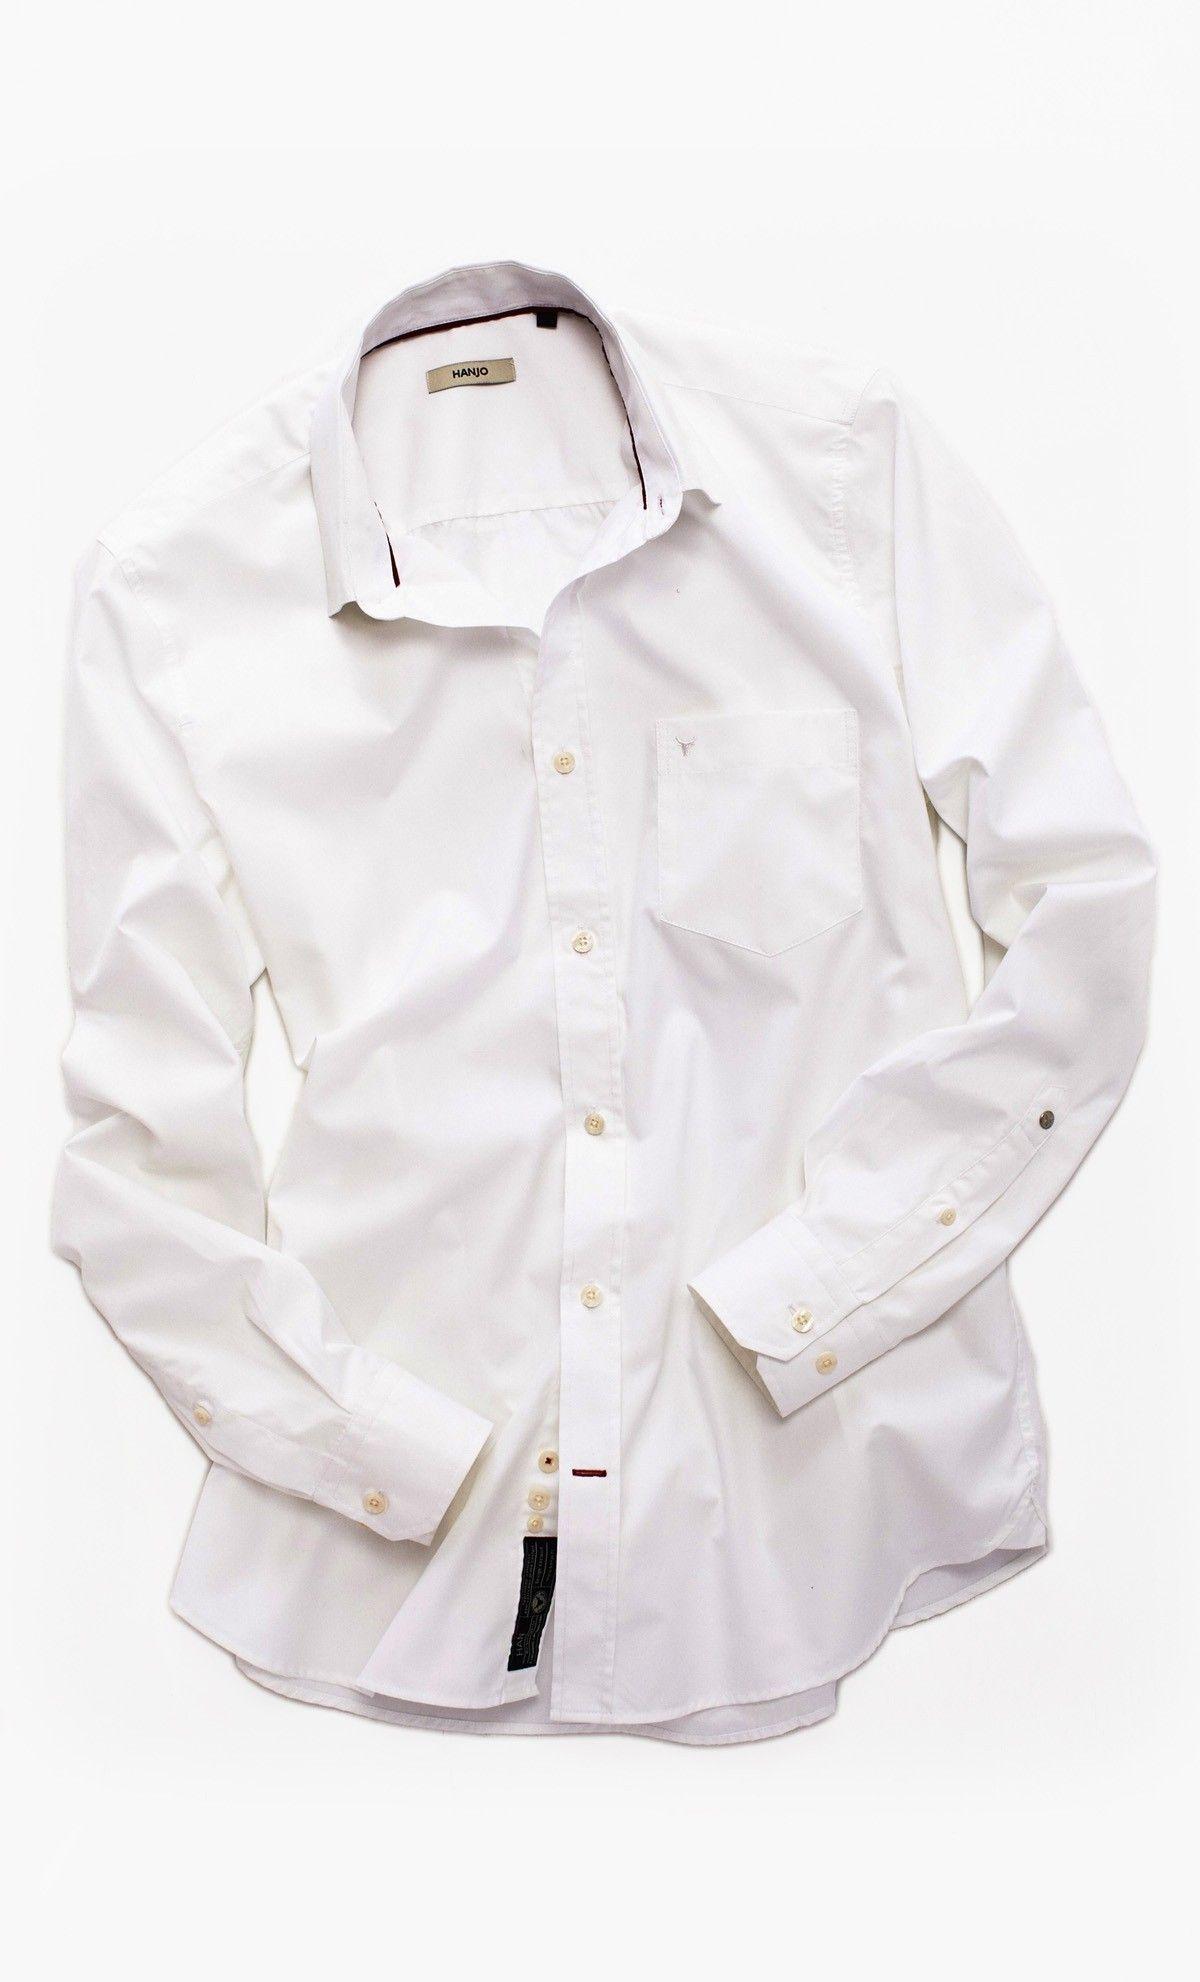 100 Mode Blanche Chemise Popeline Uni Coton Homme Style wrxx45FndI